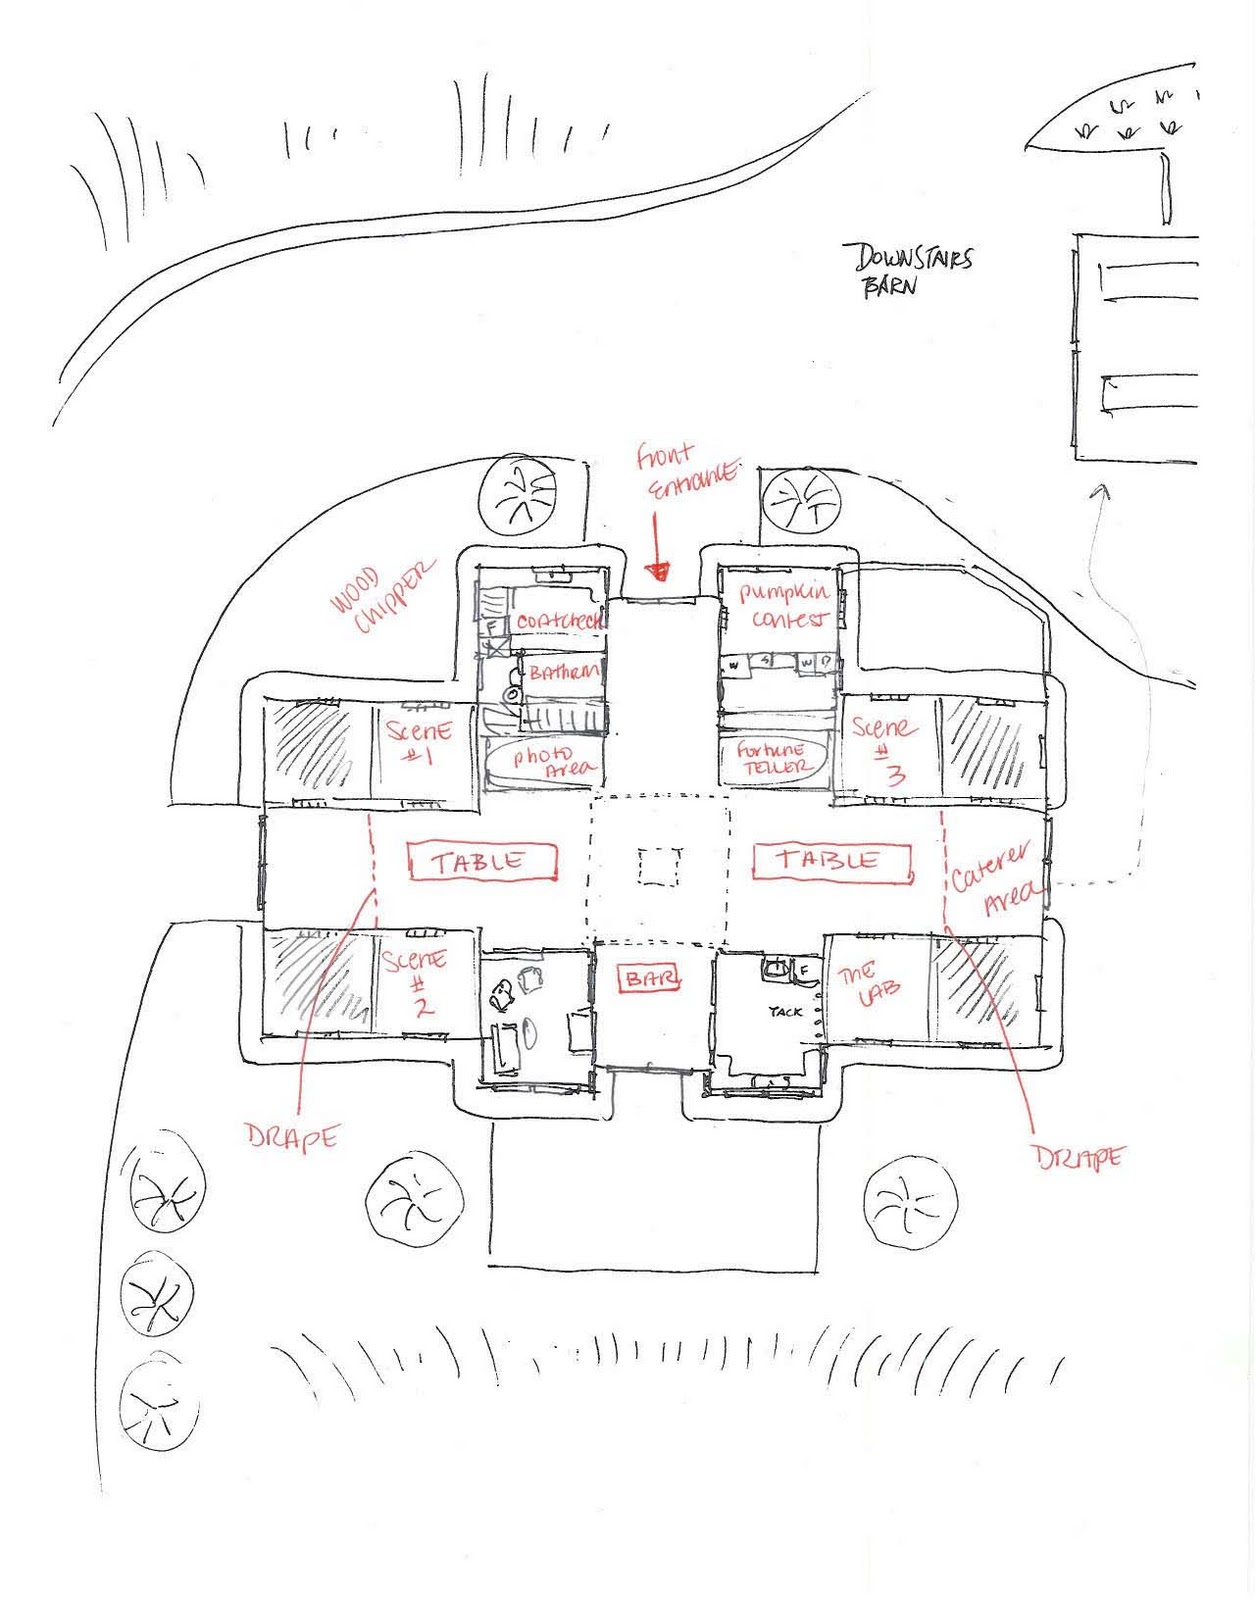 1255x1600 Horse Barn Design Layout 8x10x12x14x16x18x20x22x24 Josep